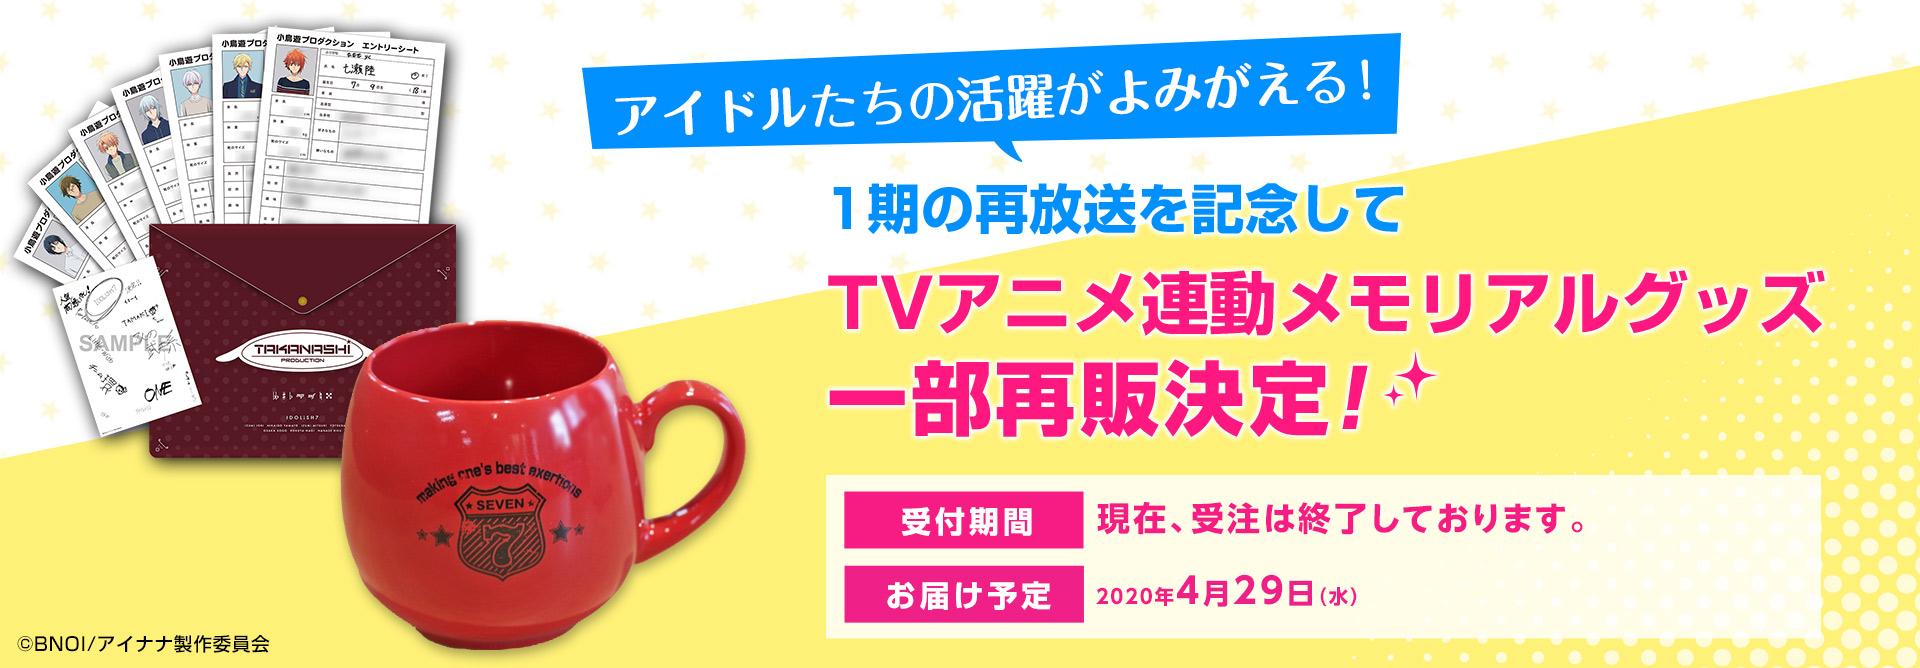 TVアニメ連動メモリアルグッズ 一部再販決定!